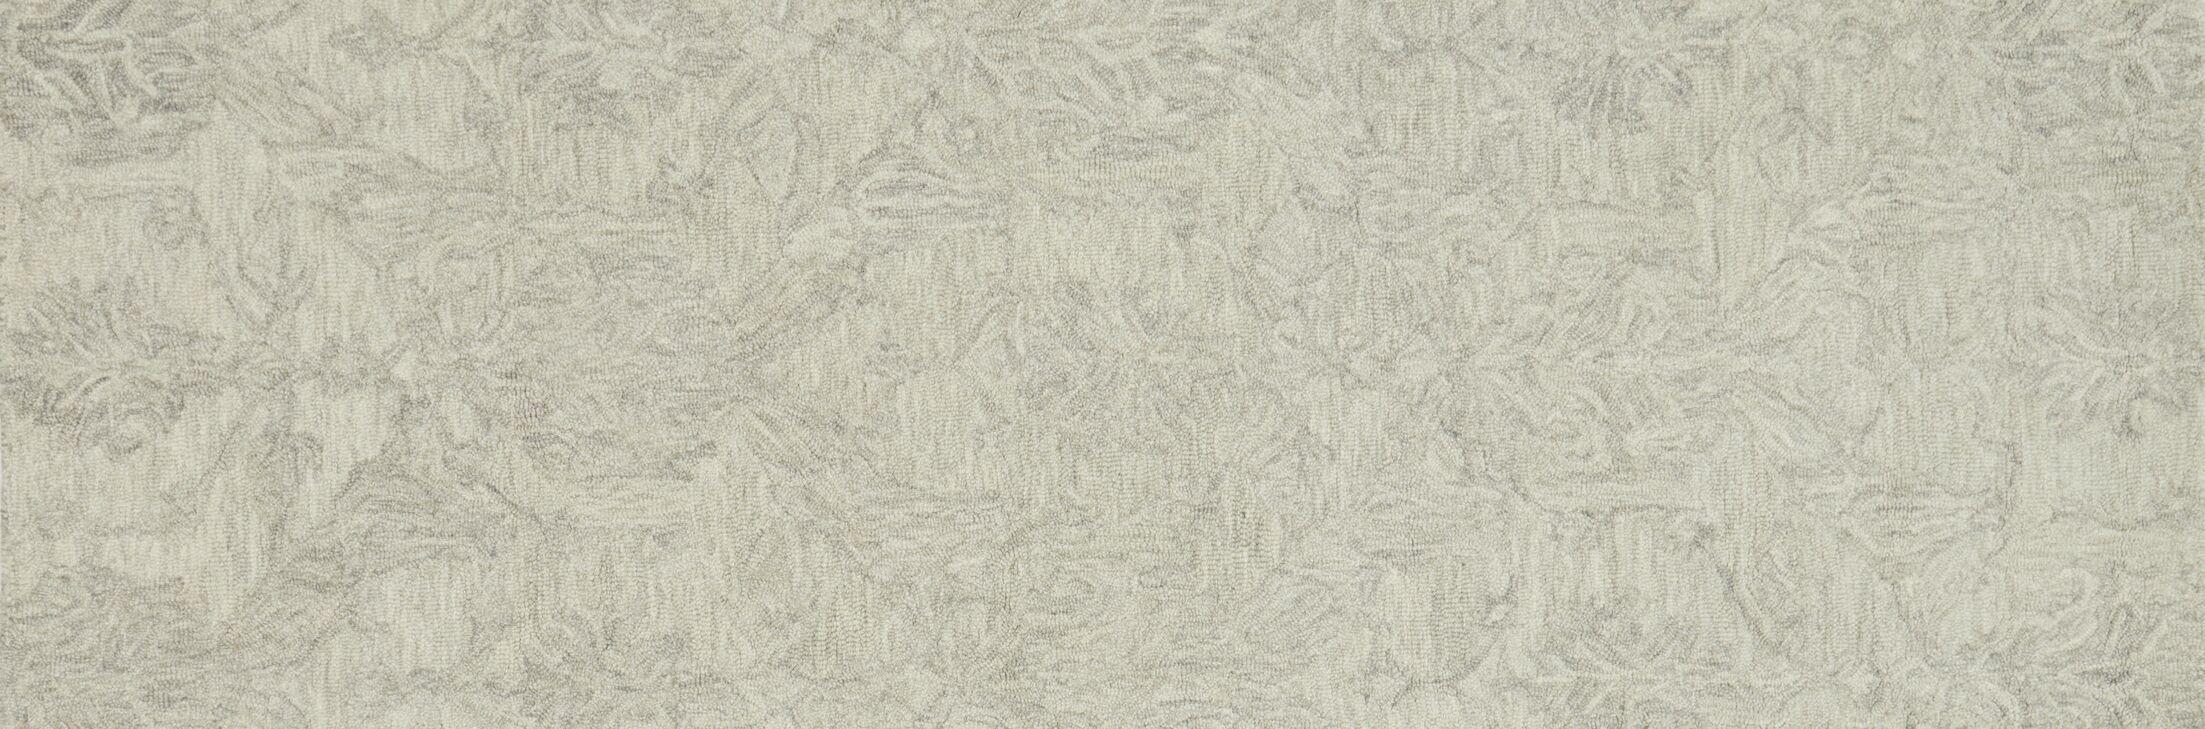 Darryl Hand-Hooked Mist Area Rug Rug Size: Runner 2'6